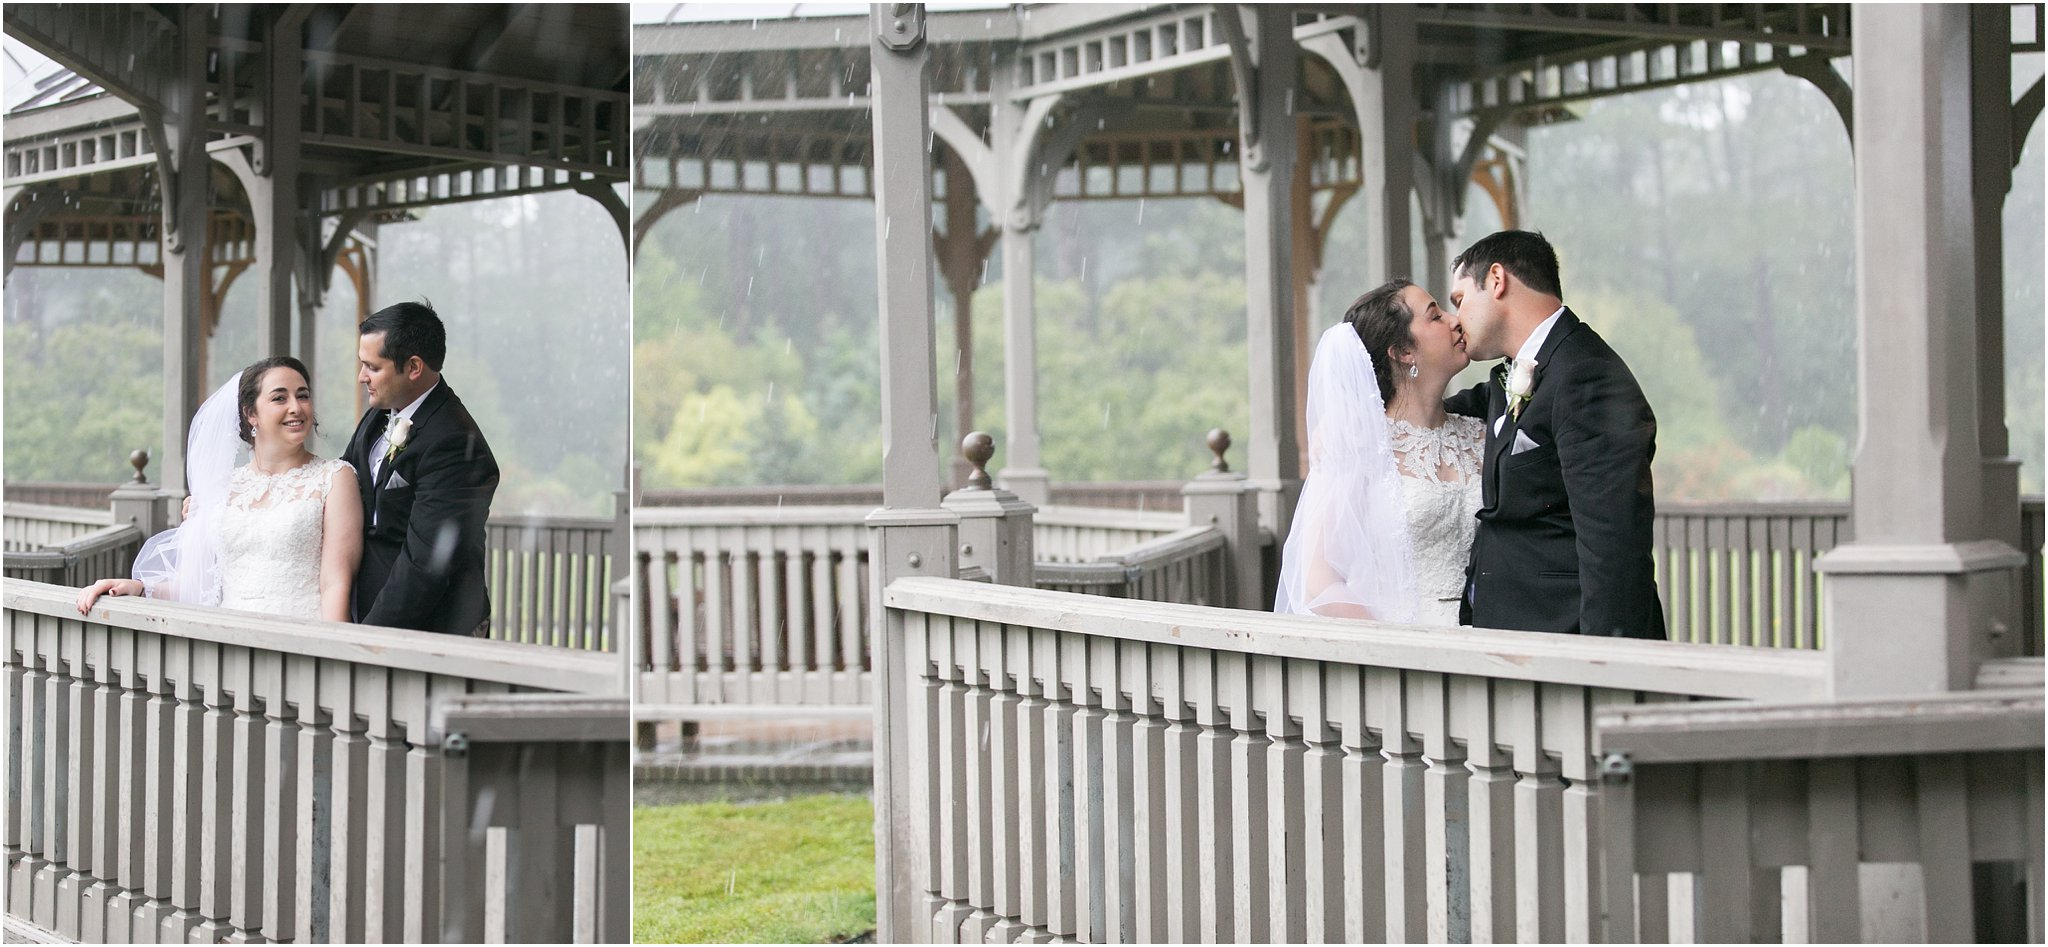 jessica_ryan_photography_virginia_wedding_photographer_wedding_hurricane_norfolk_botanical_gardens_hurricane_matthew_wedding_3566